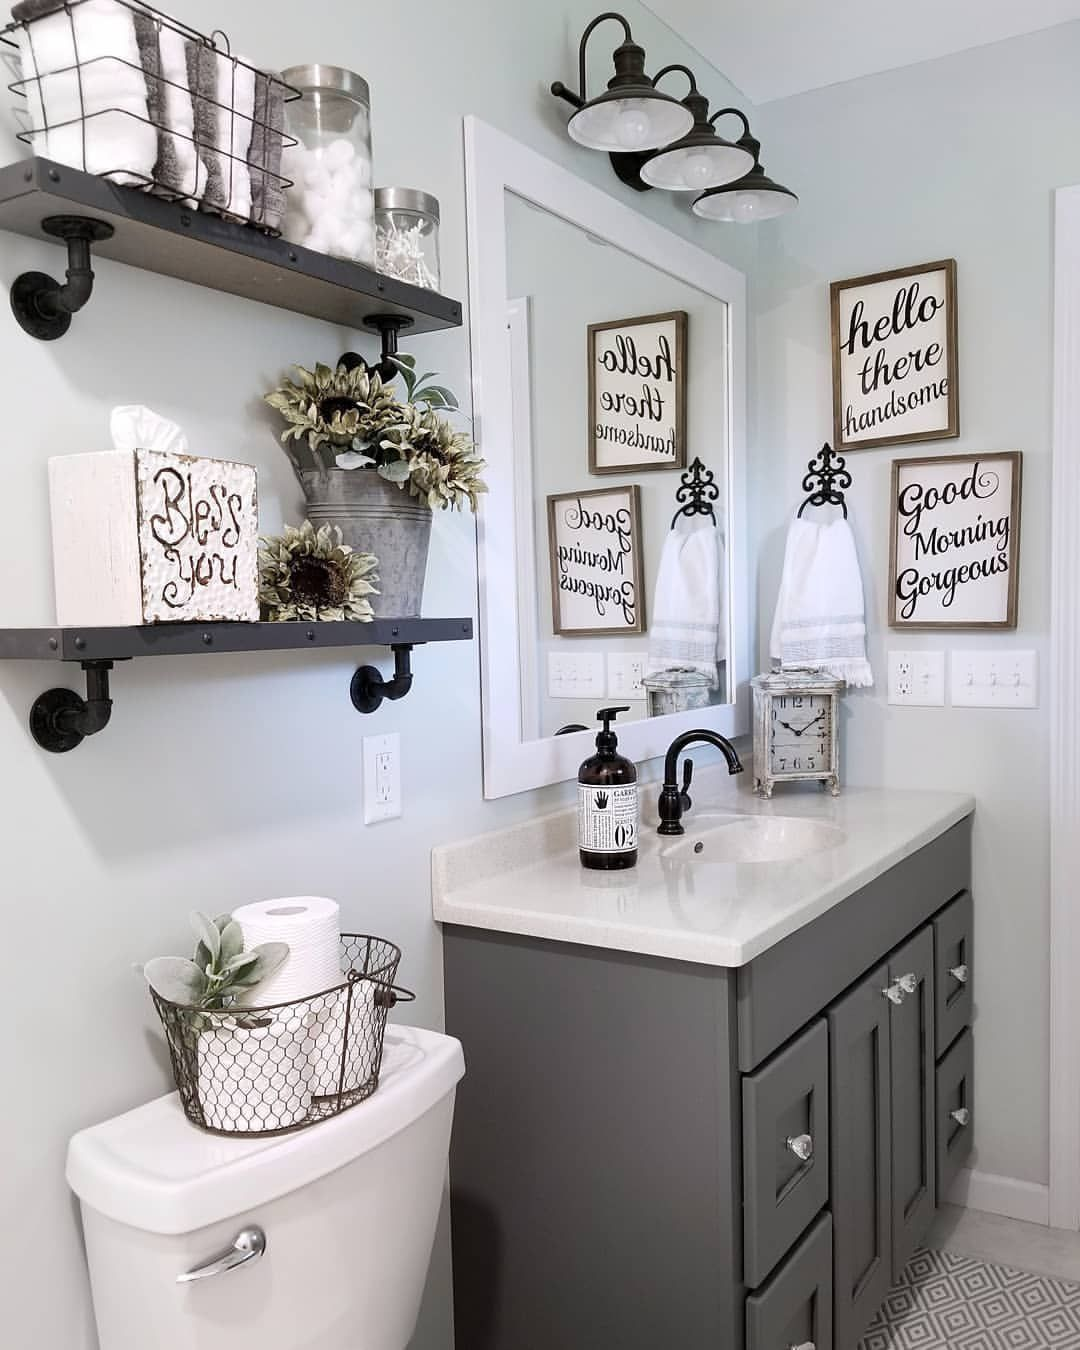 Bathroom Decorations 2021 in 2020 | Farmhouse bathroom ...